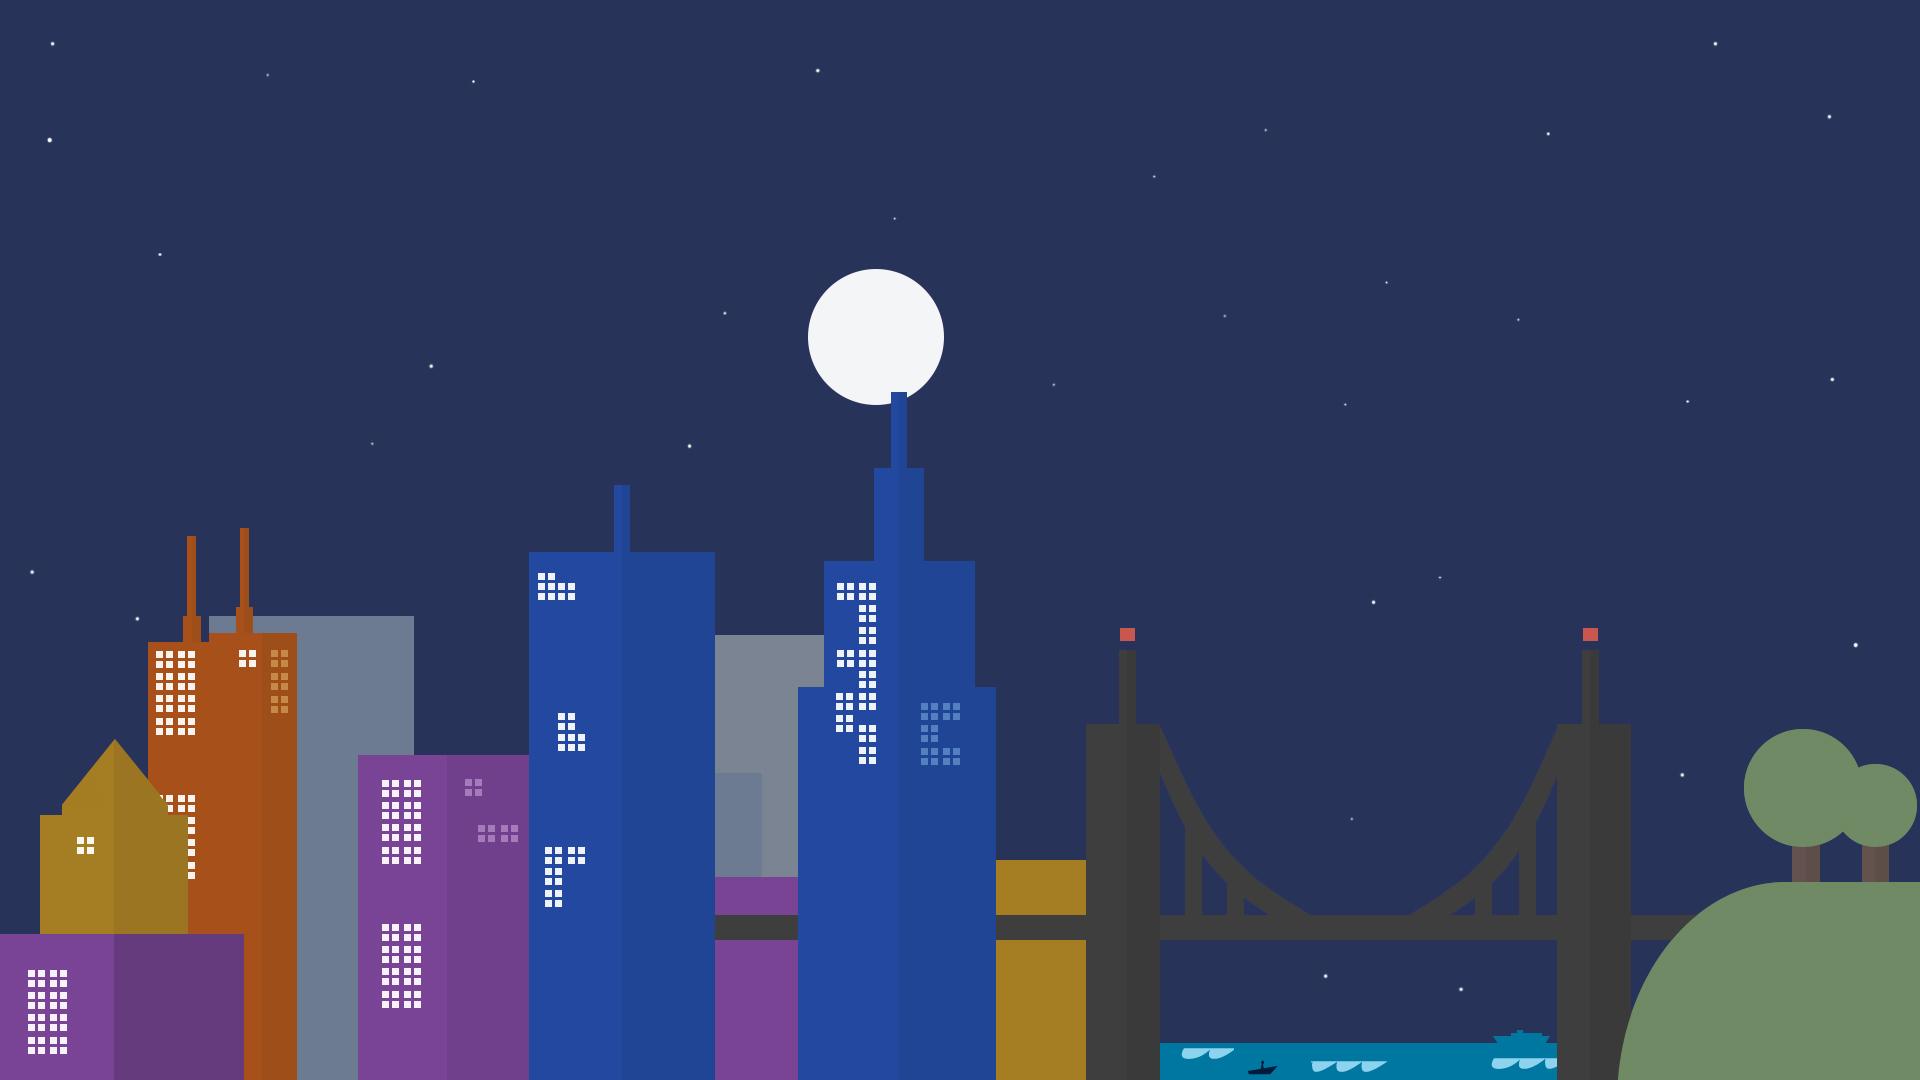 Google Inspired Wallpaper (Night)